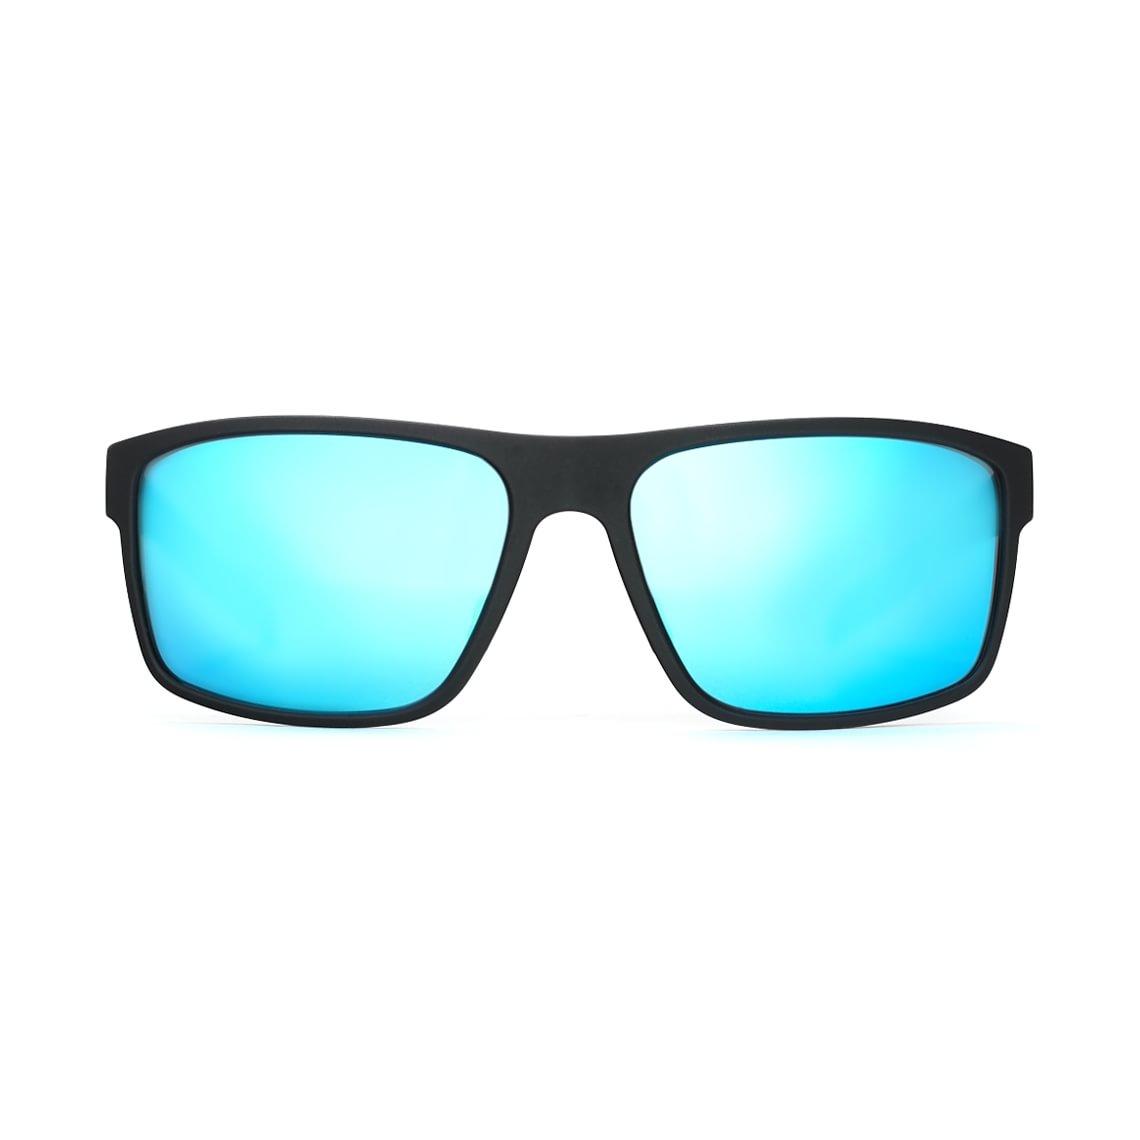 Adidas Whipstart Blue Mirror A423 00 6055